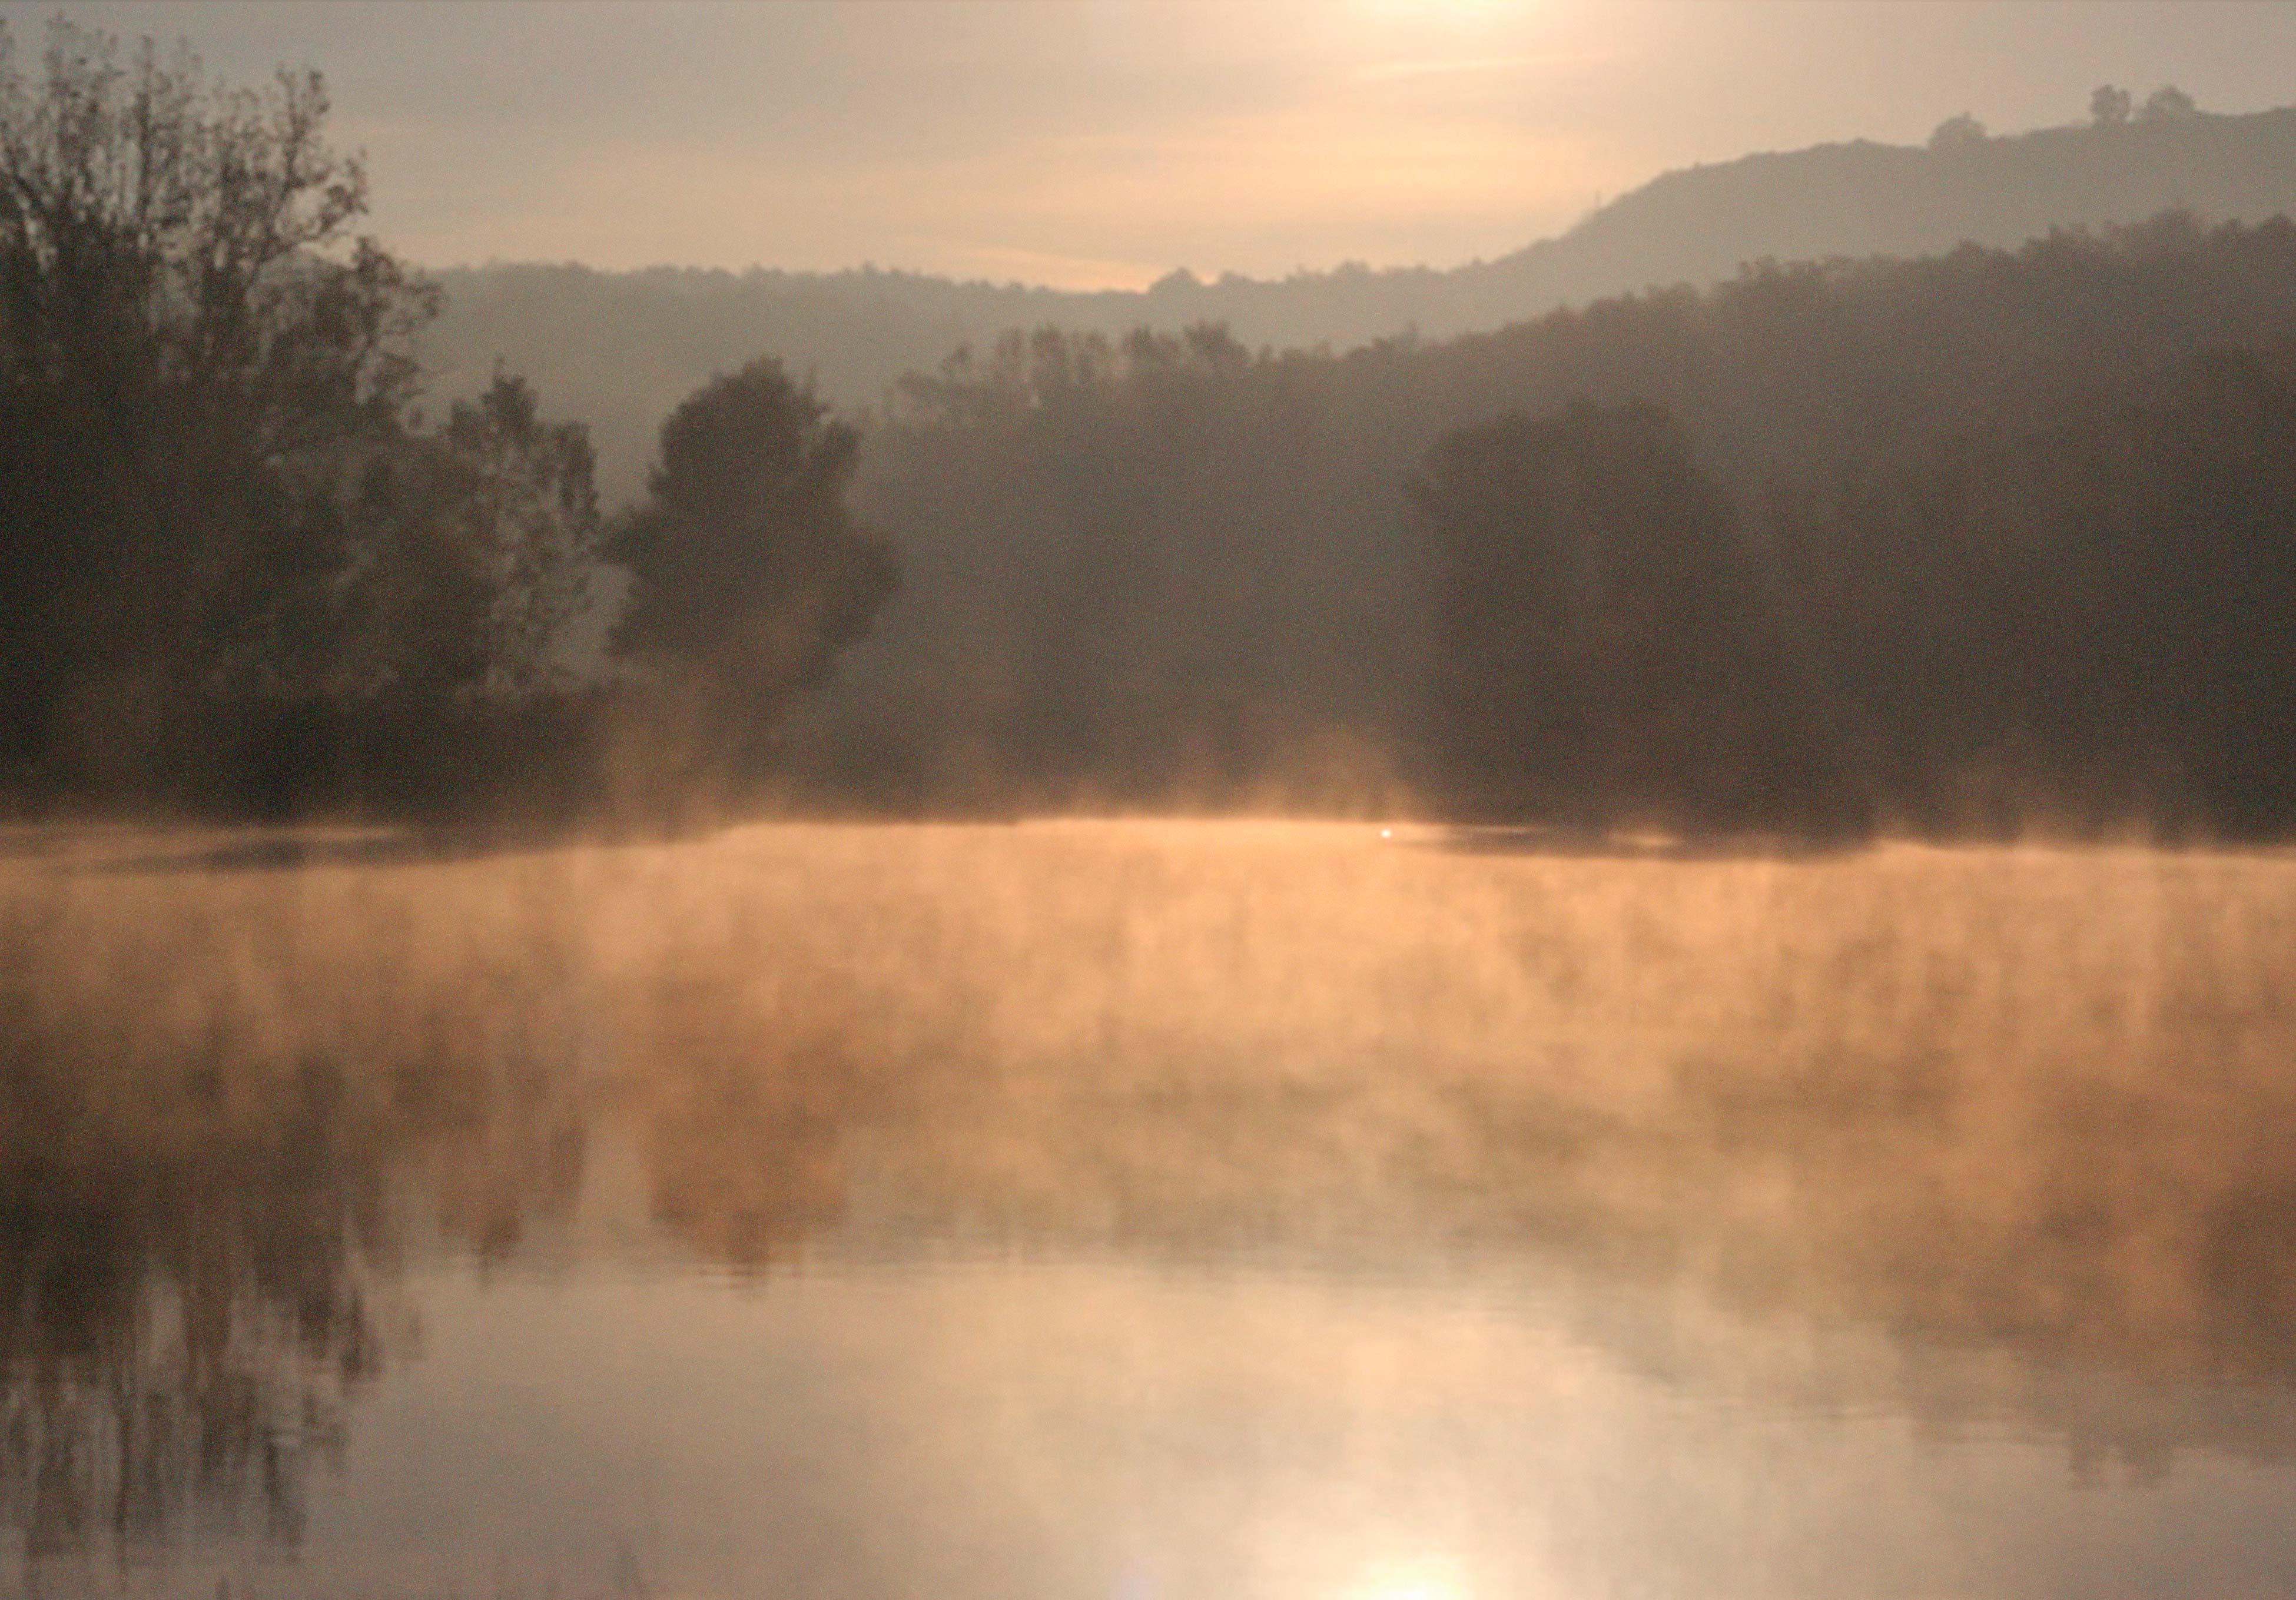 szalkai_to_morning_peace_csige_kert_gard